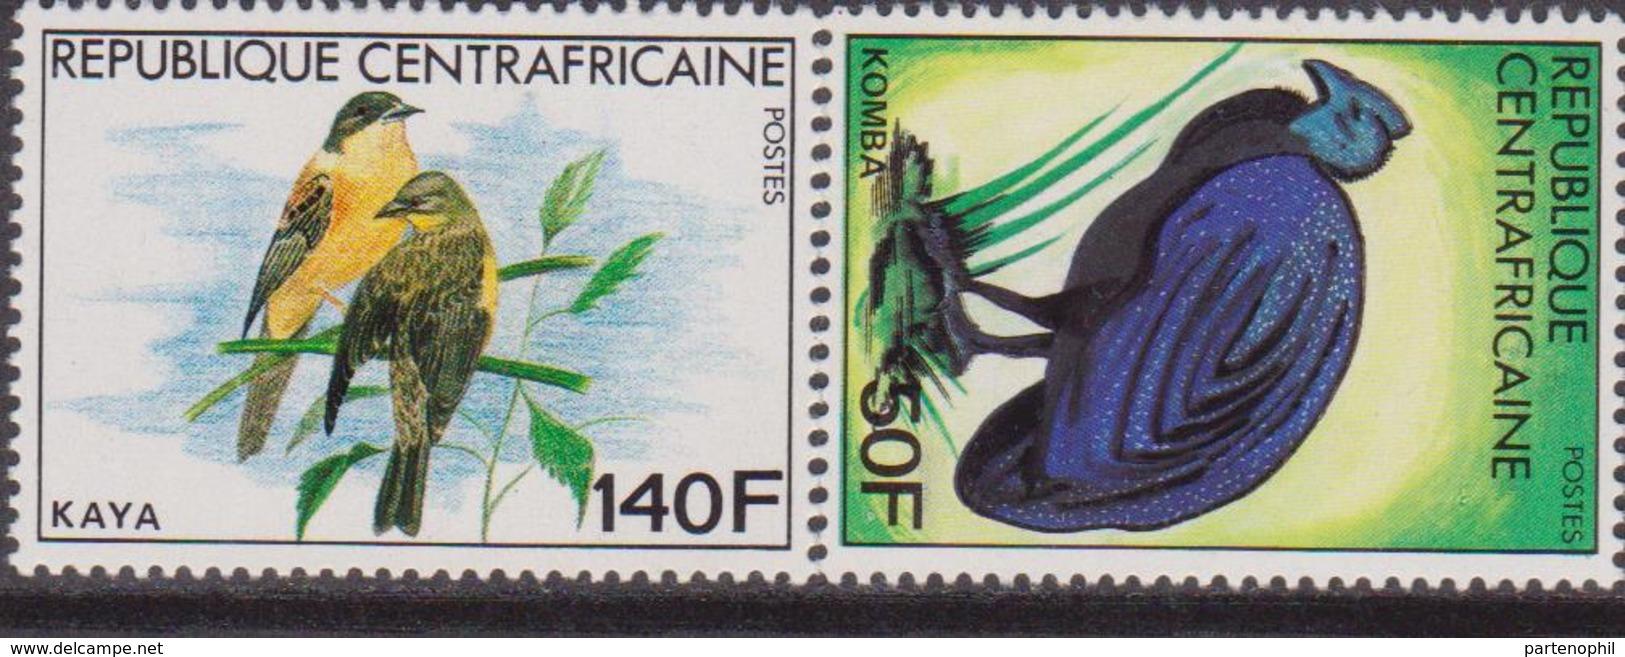 Rep. Centrafricaine - Uccelli Birds Set MNH - Repubblica Centroafricana